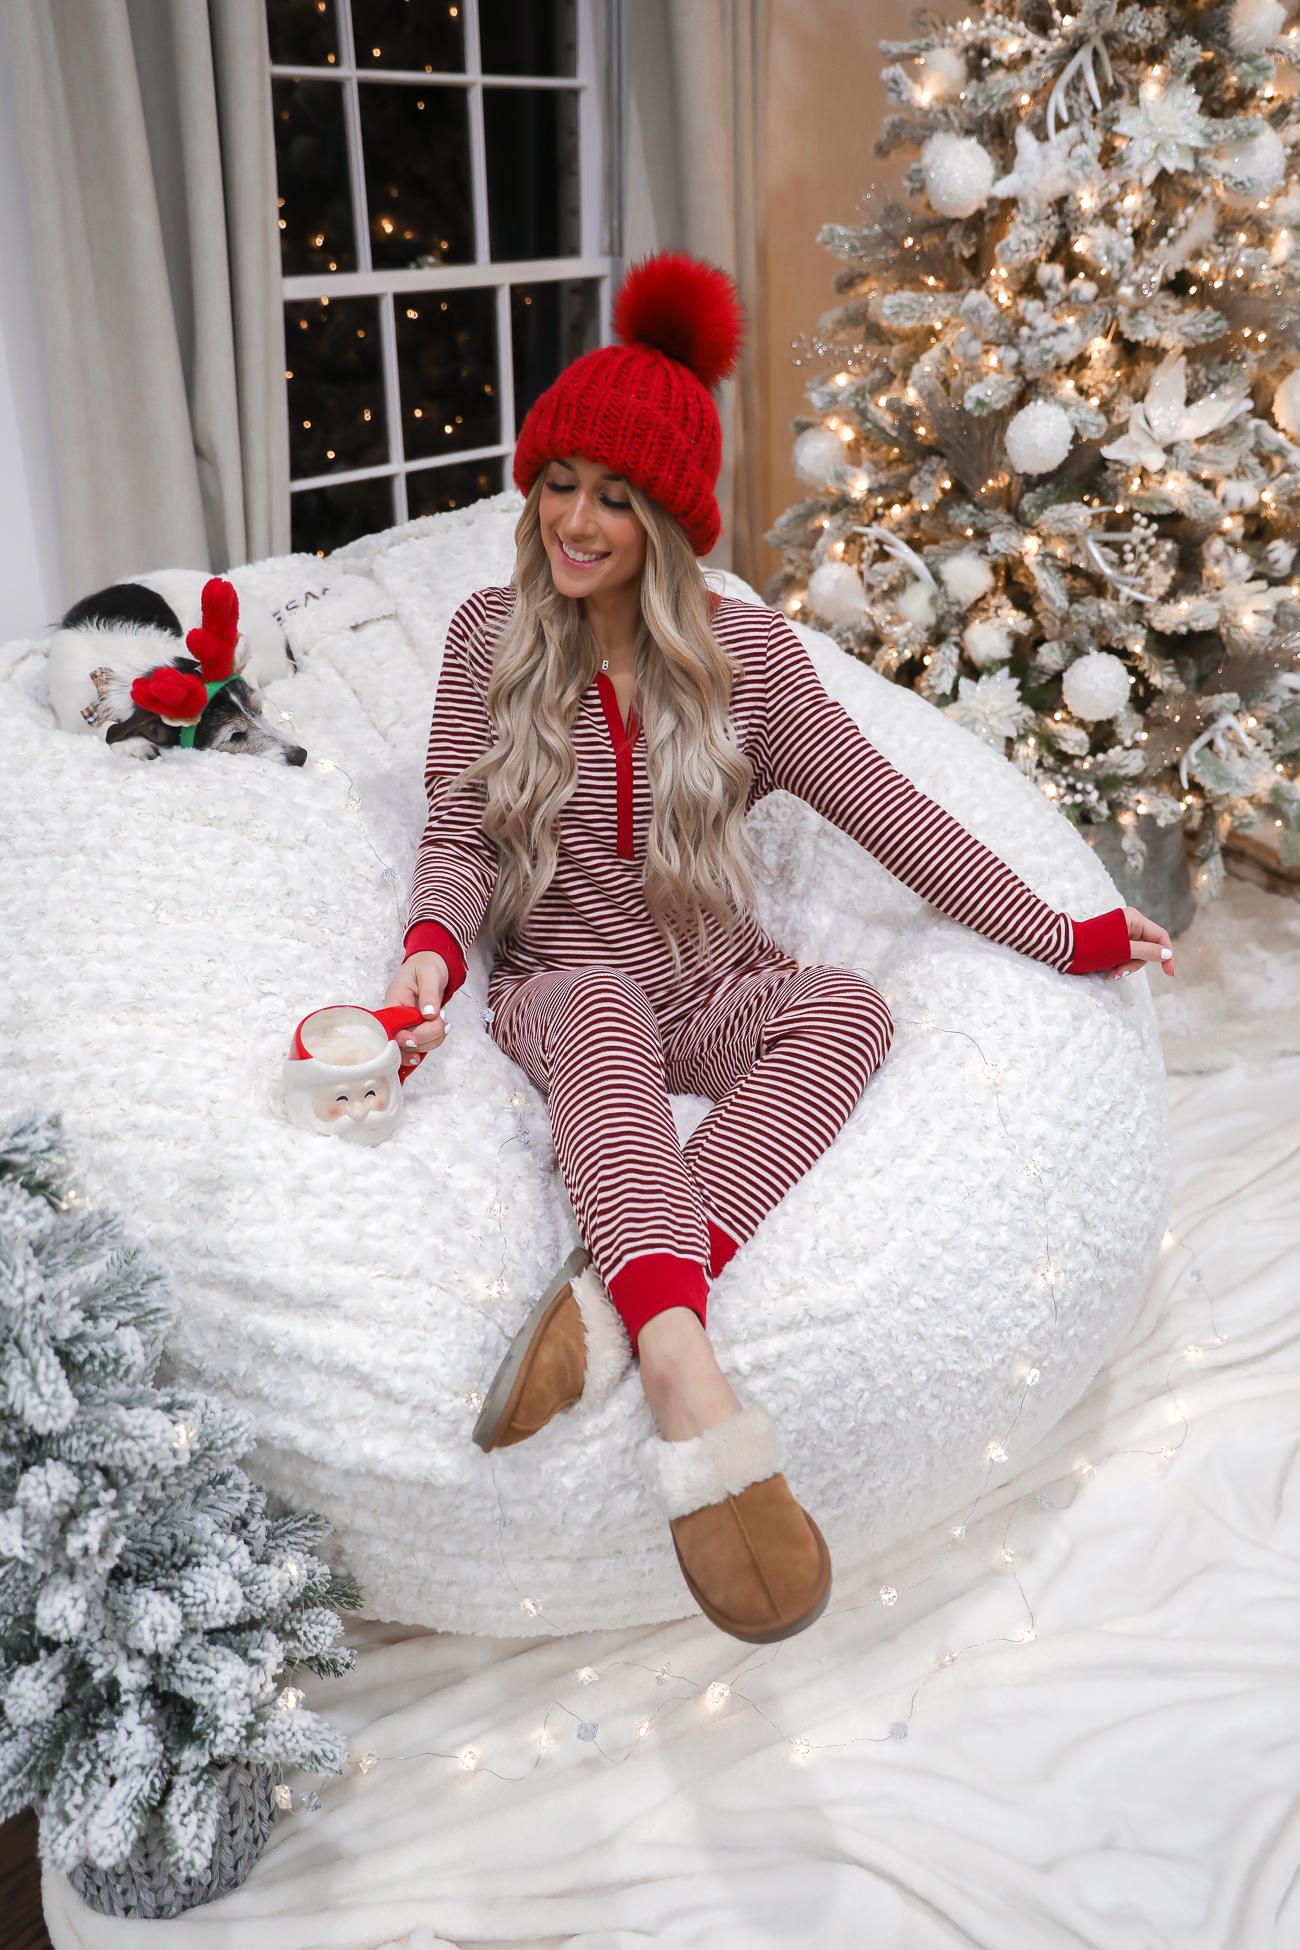 Jockey Cozy Chirstmas Pajamas King Of Christmas Flocked Tree Lovesac Bean bag White Christmas Laura Beverlin (5 of 22)